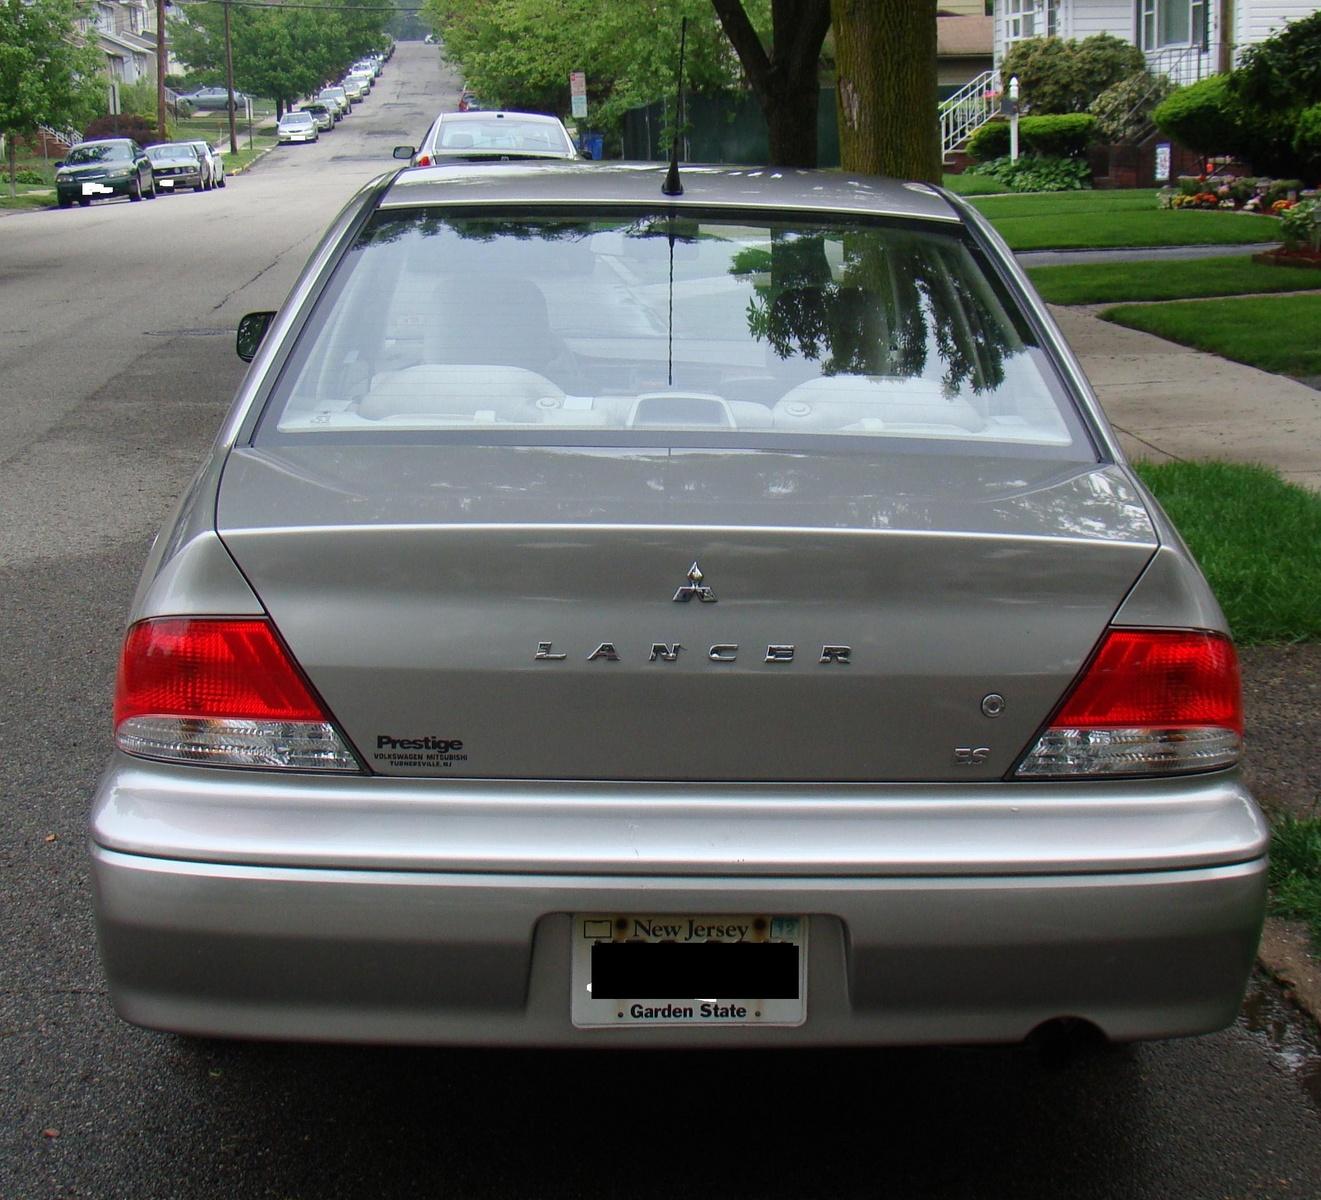 2003 Mitsubishi Lancer - Pictures - CarGurus